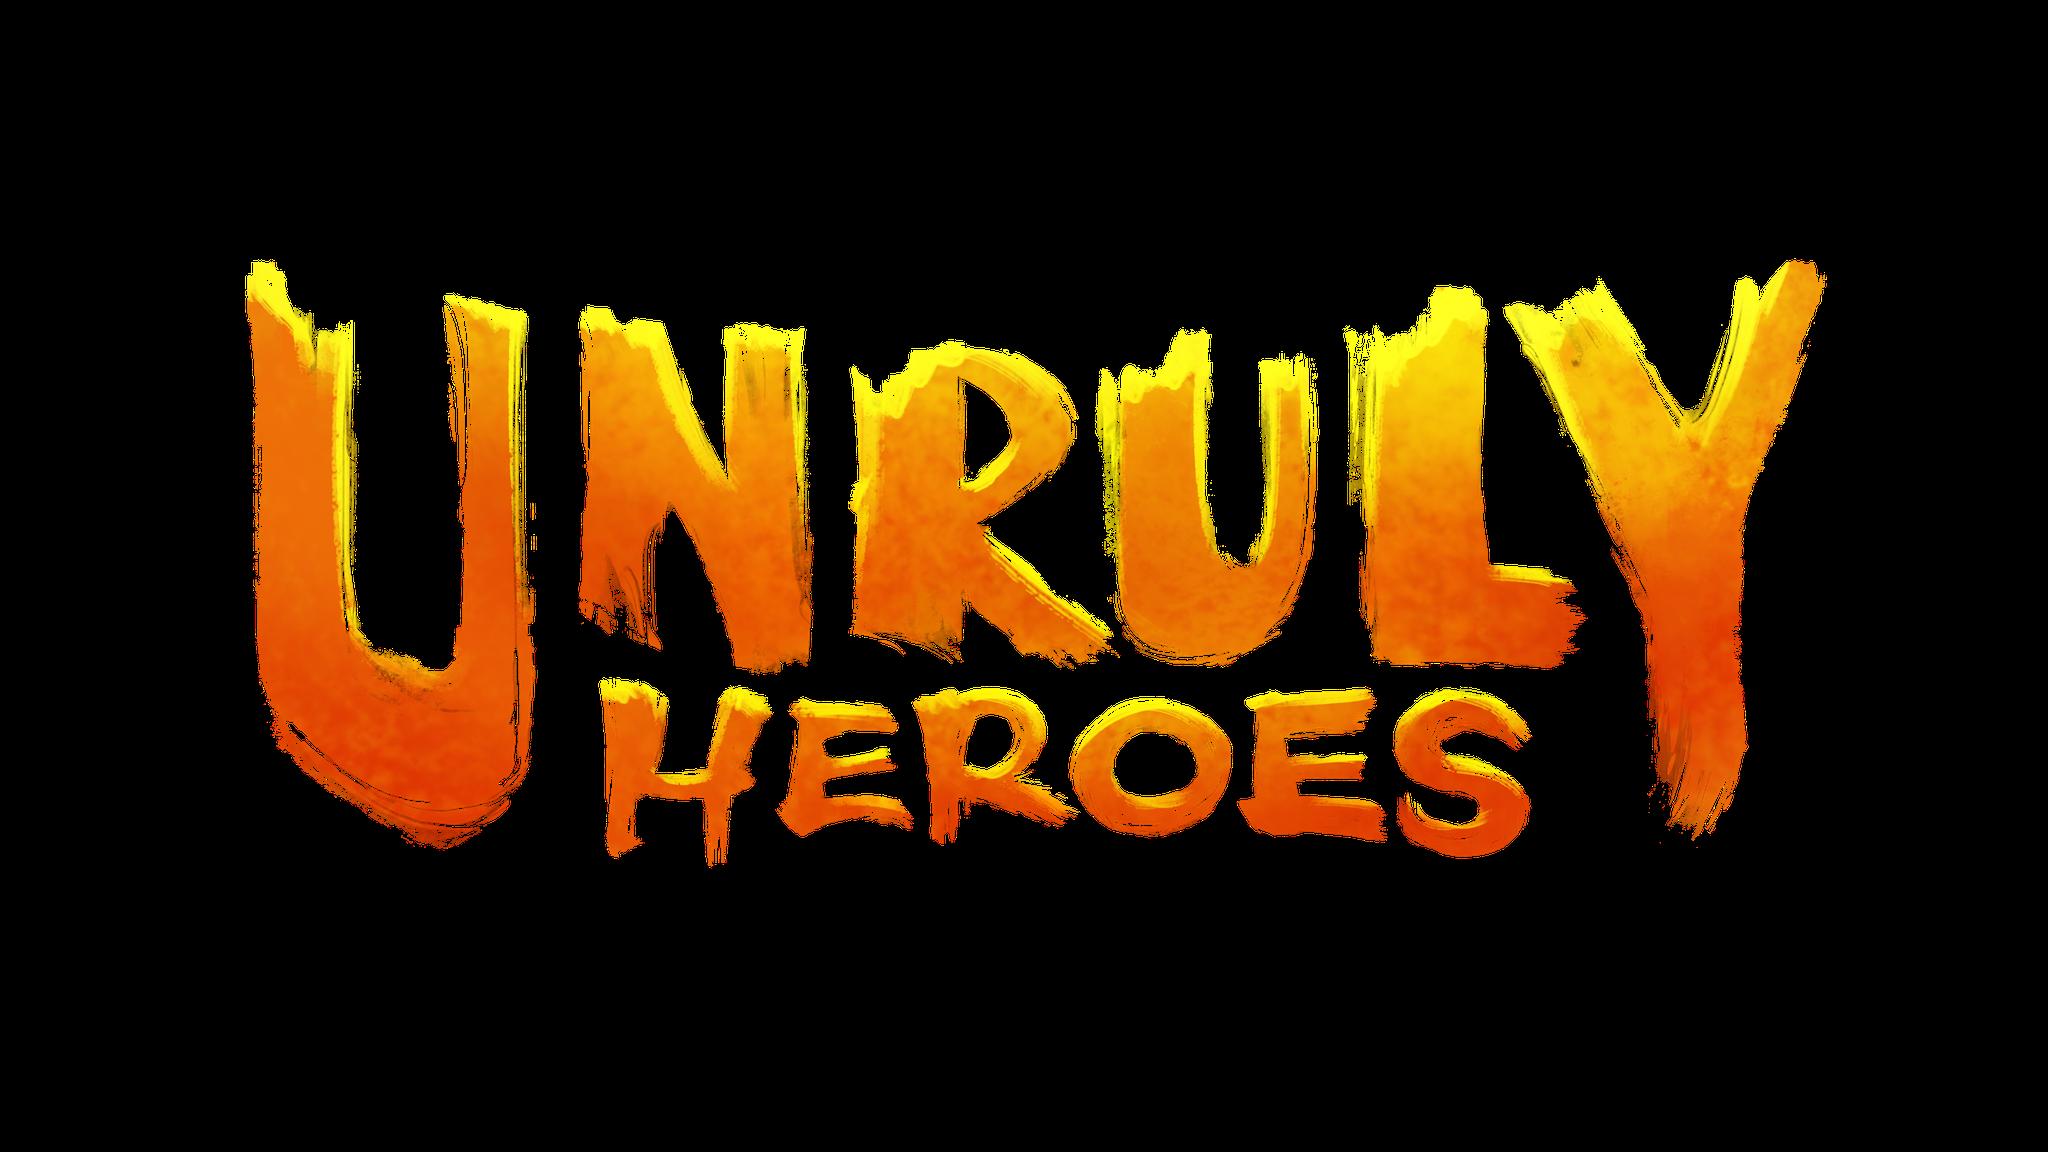 Unruly Heroes in arrivo su iOS e Android il 18 marzo